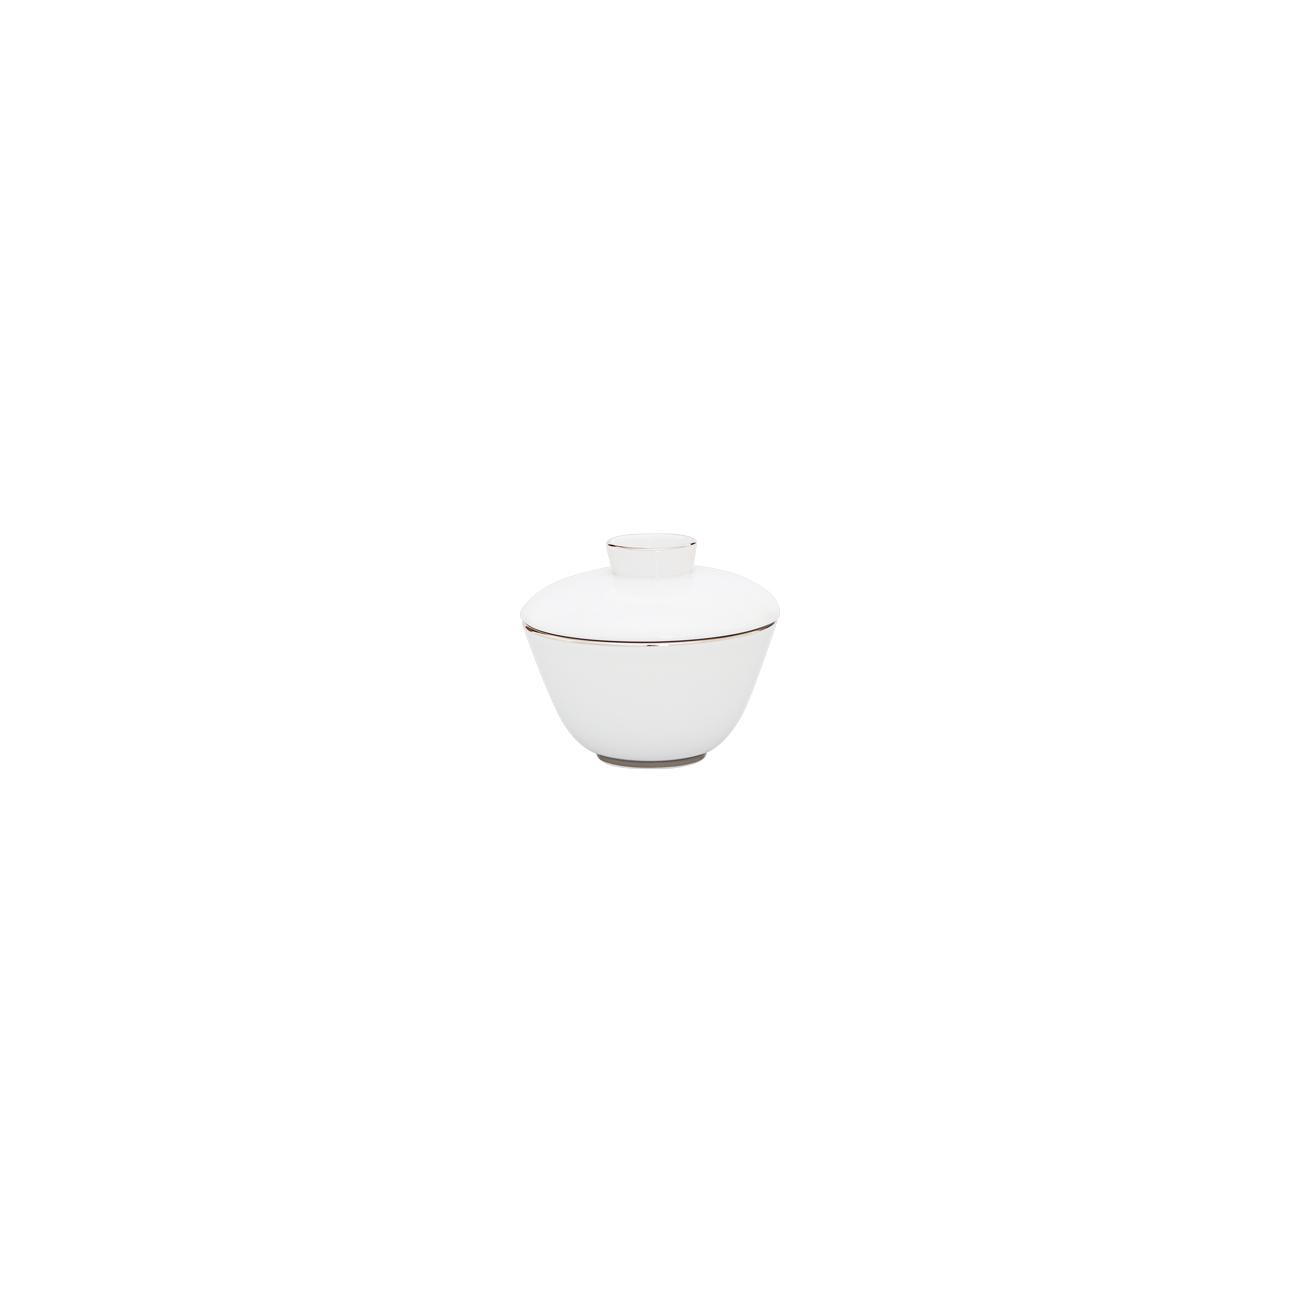 Bowl 8cm | Cover 8cm 0